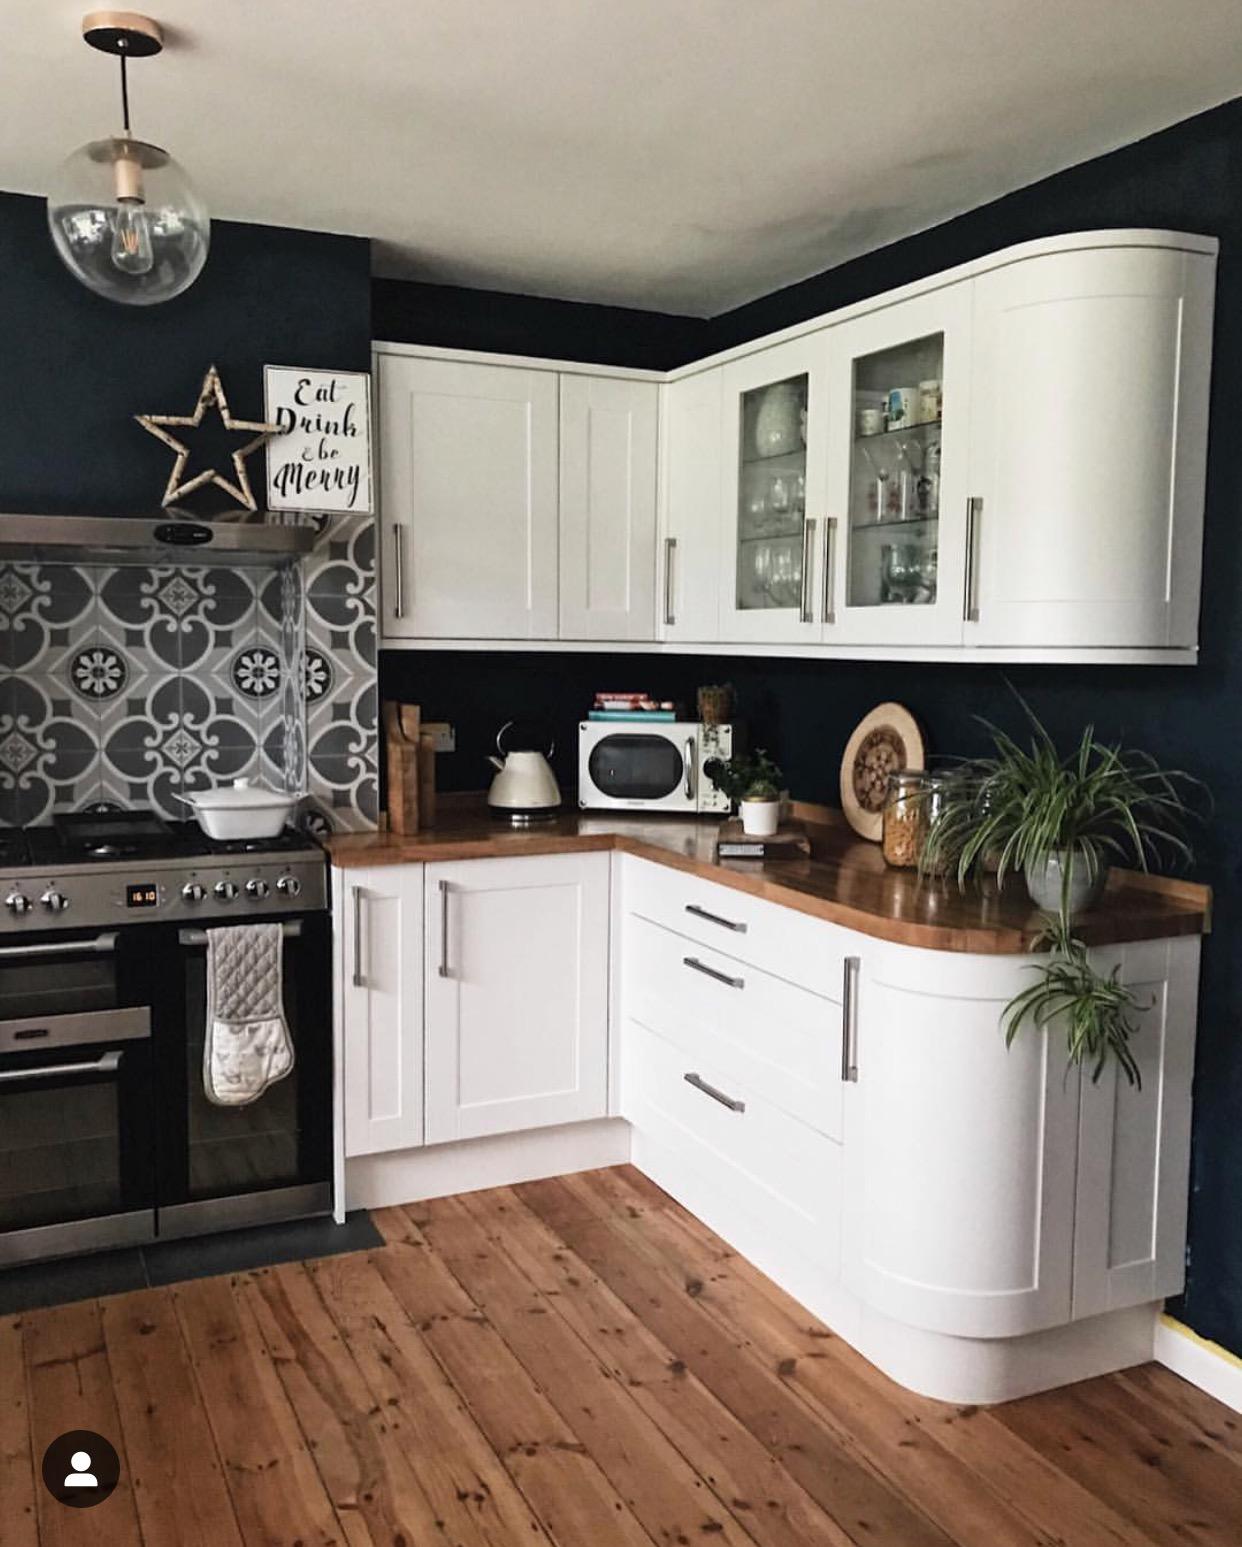 A hastily put together kitchen photo